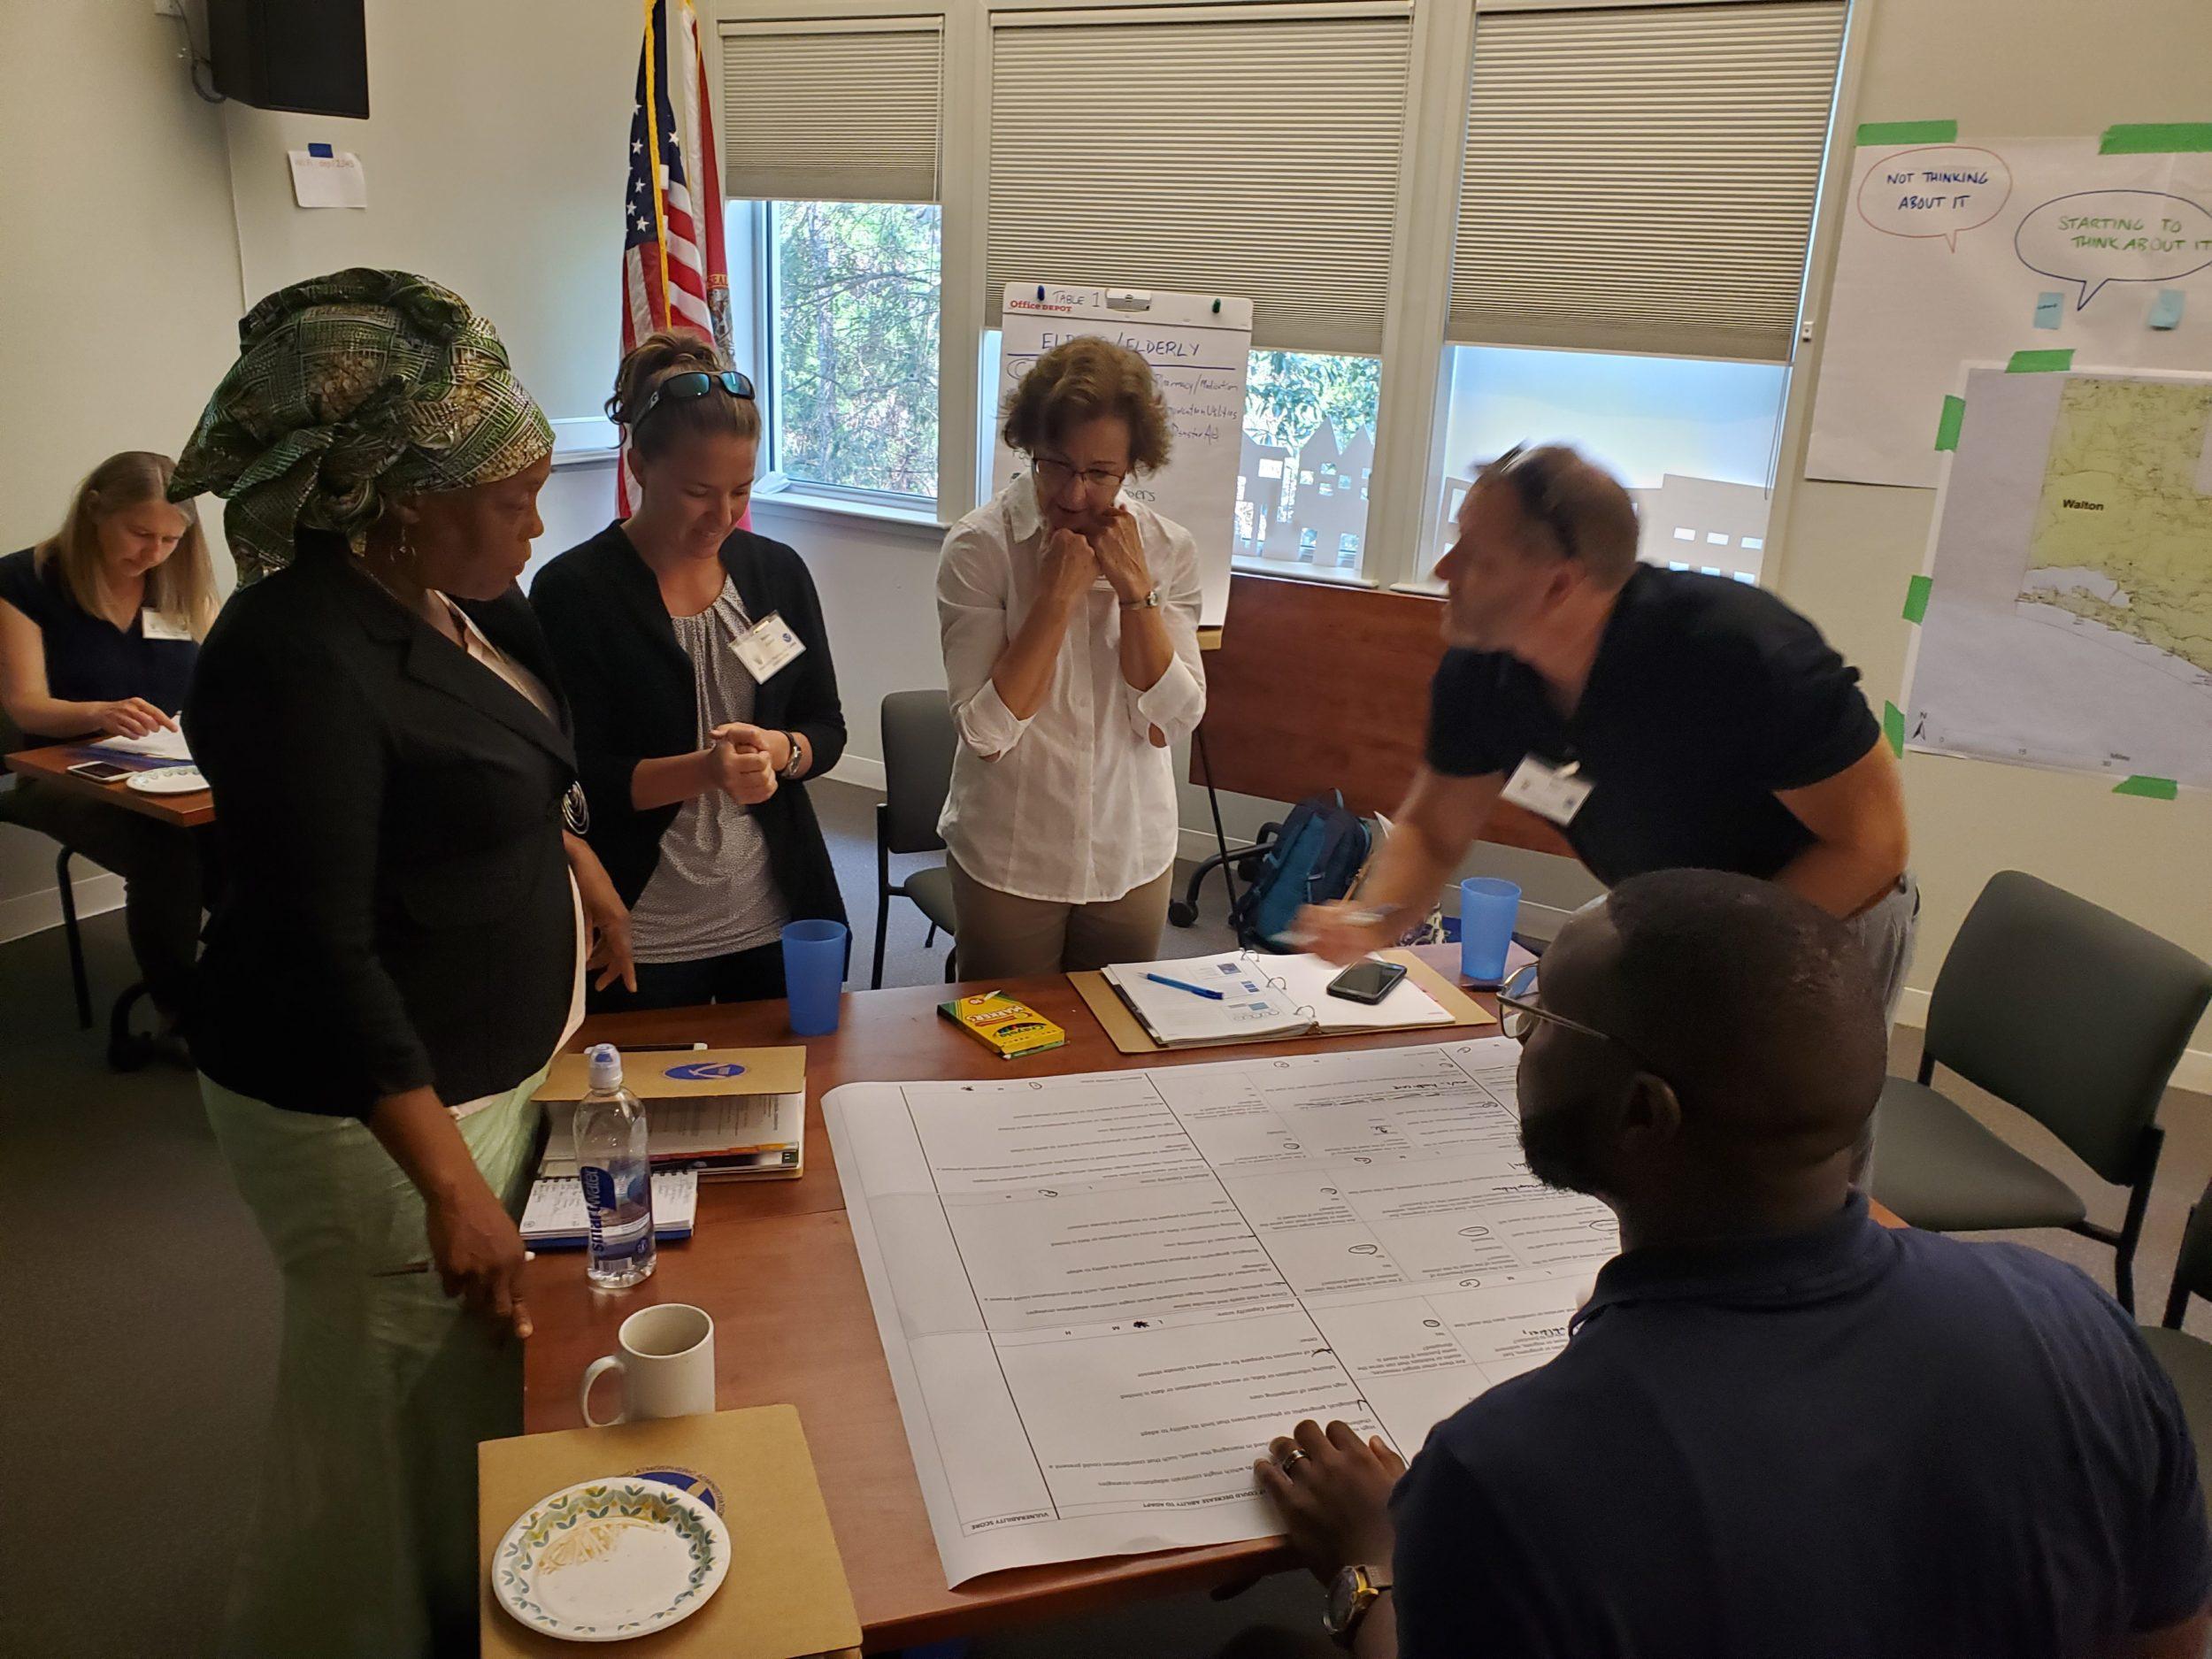 NOAA workshop Adaptation Planning for Coastal Communities